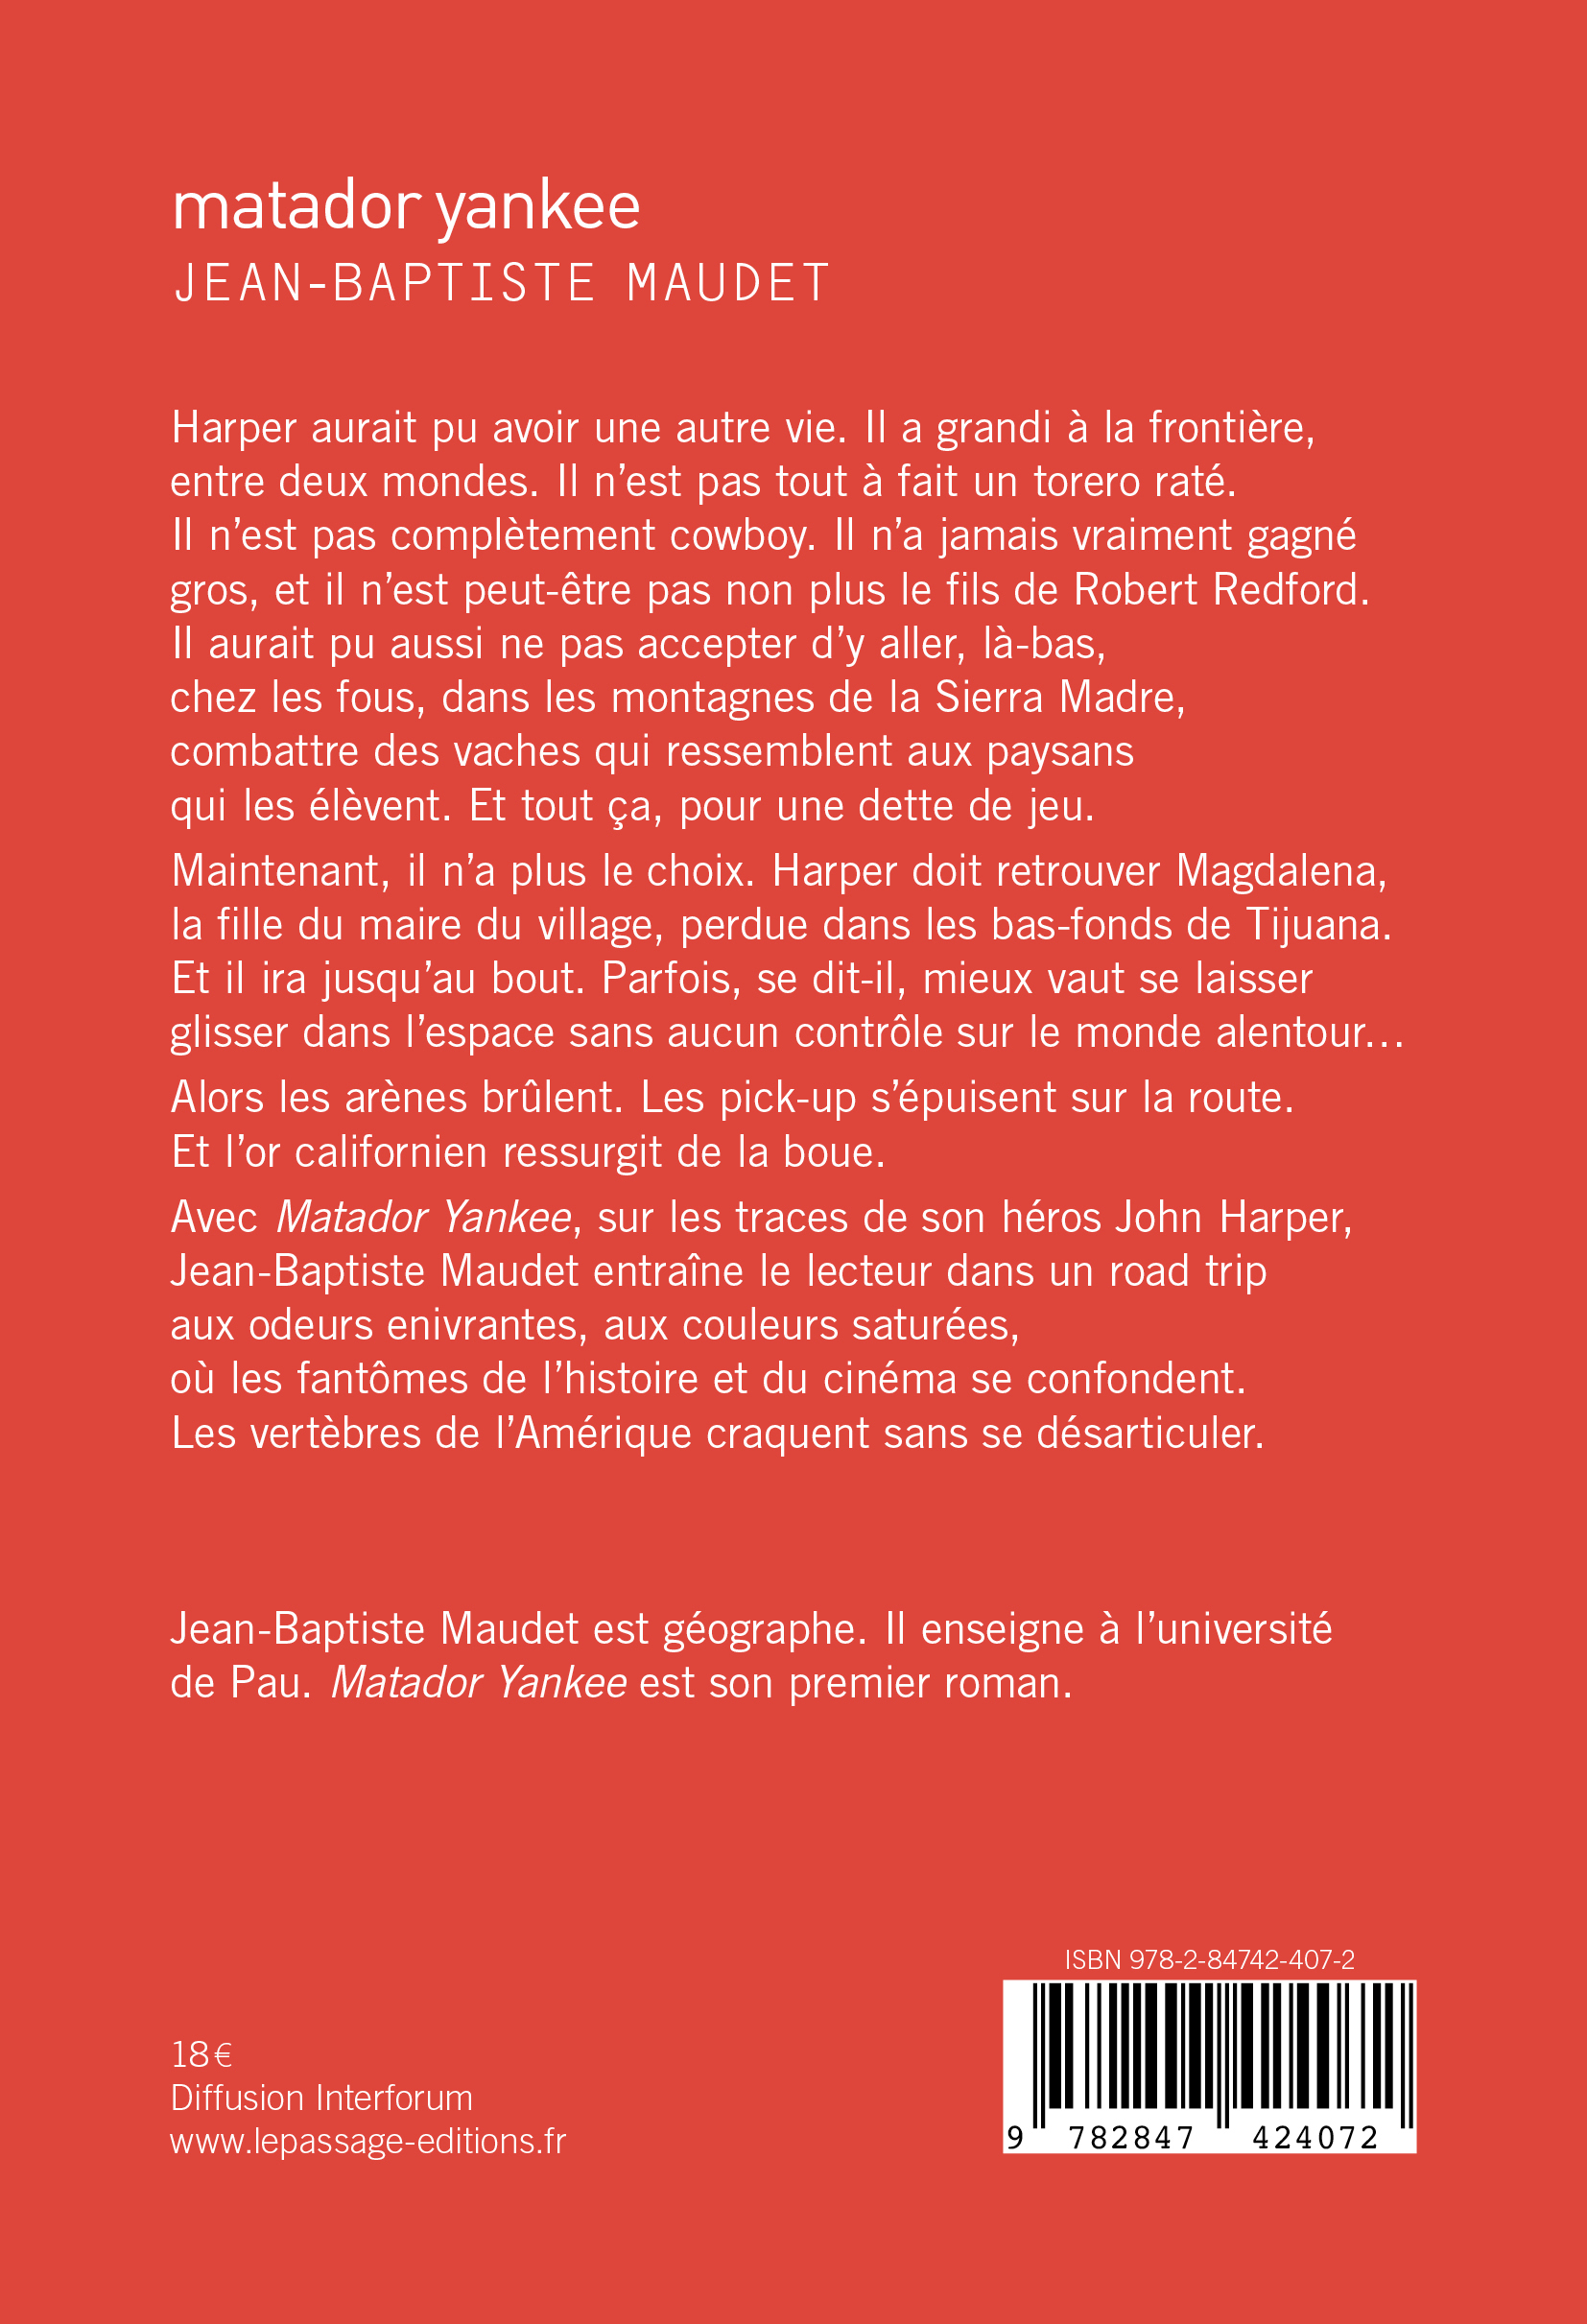 Matador_yankee-4e_Jaquette